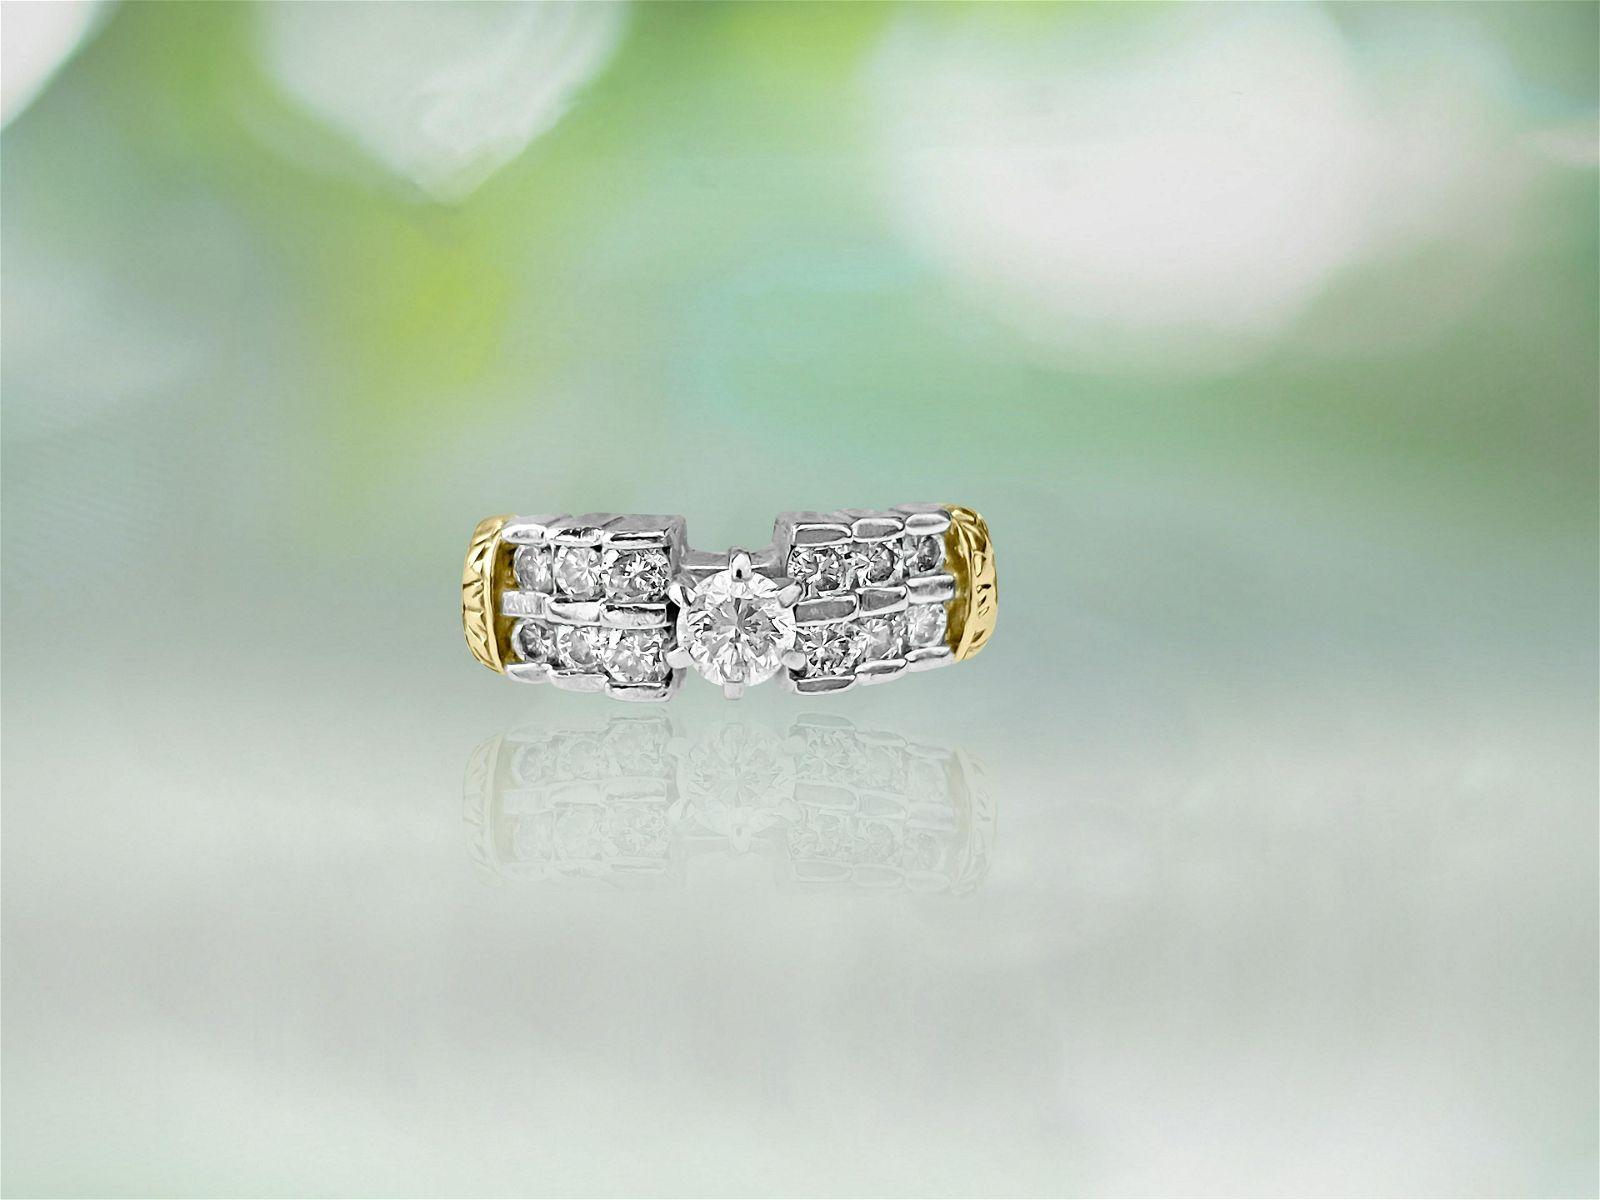 Vintage 14K Two Tone, Diamond Engagement Ring